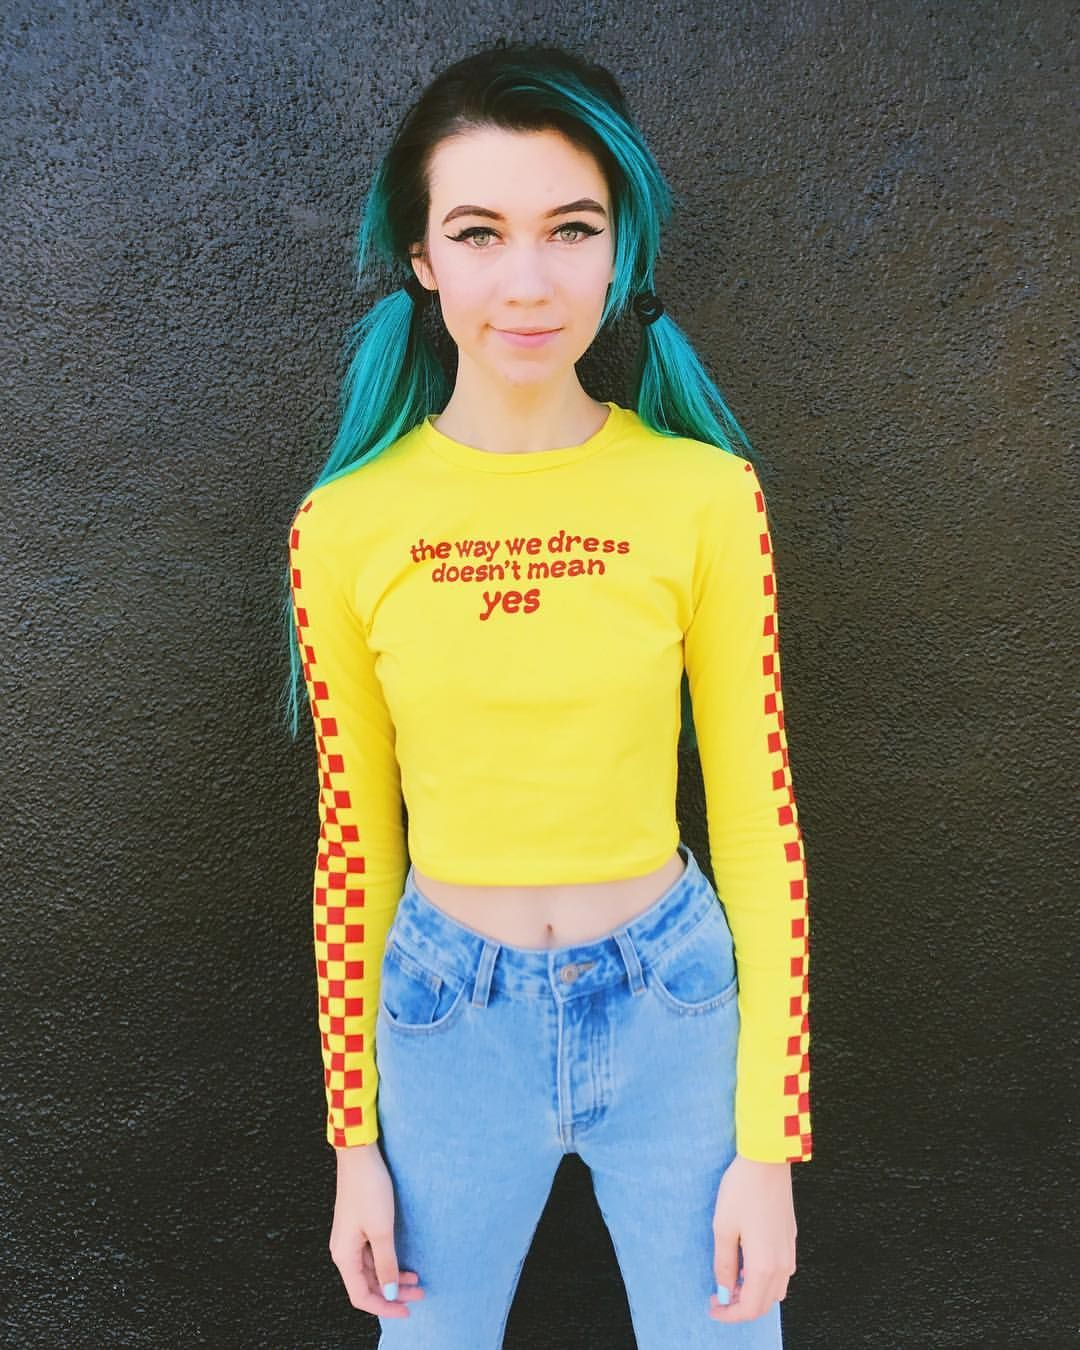 36 7k Likes 1 085 Comments Jessie Paege Jessietrash On Instagram Little Fairy Girl Jessie Paege Jessie Blue Hair